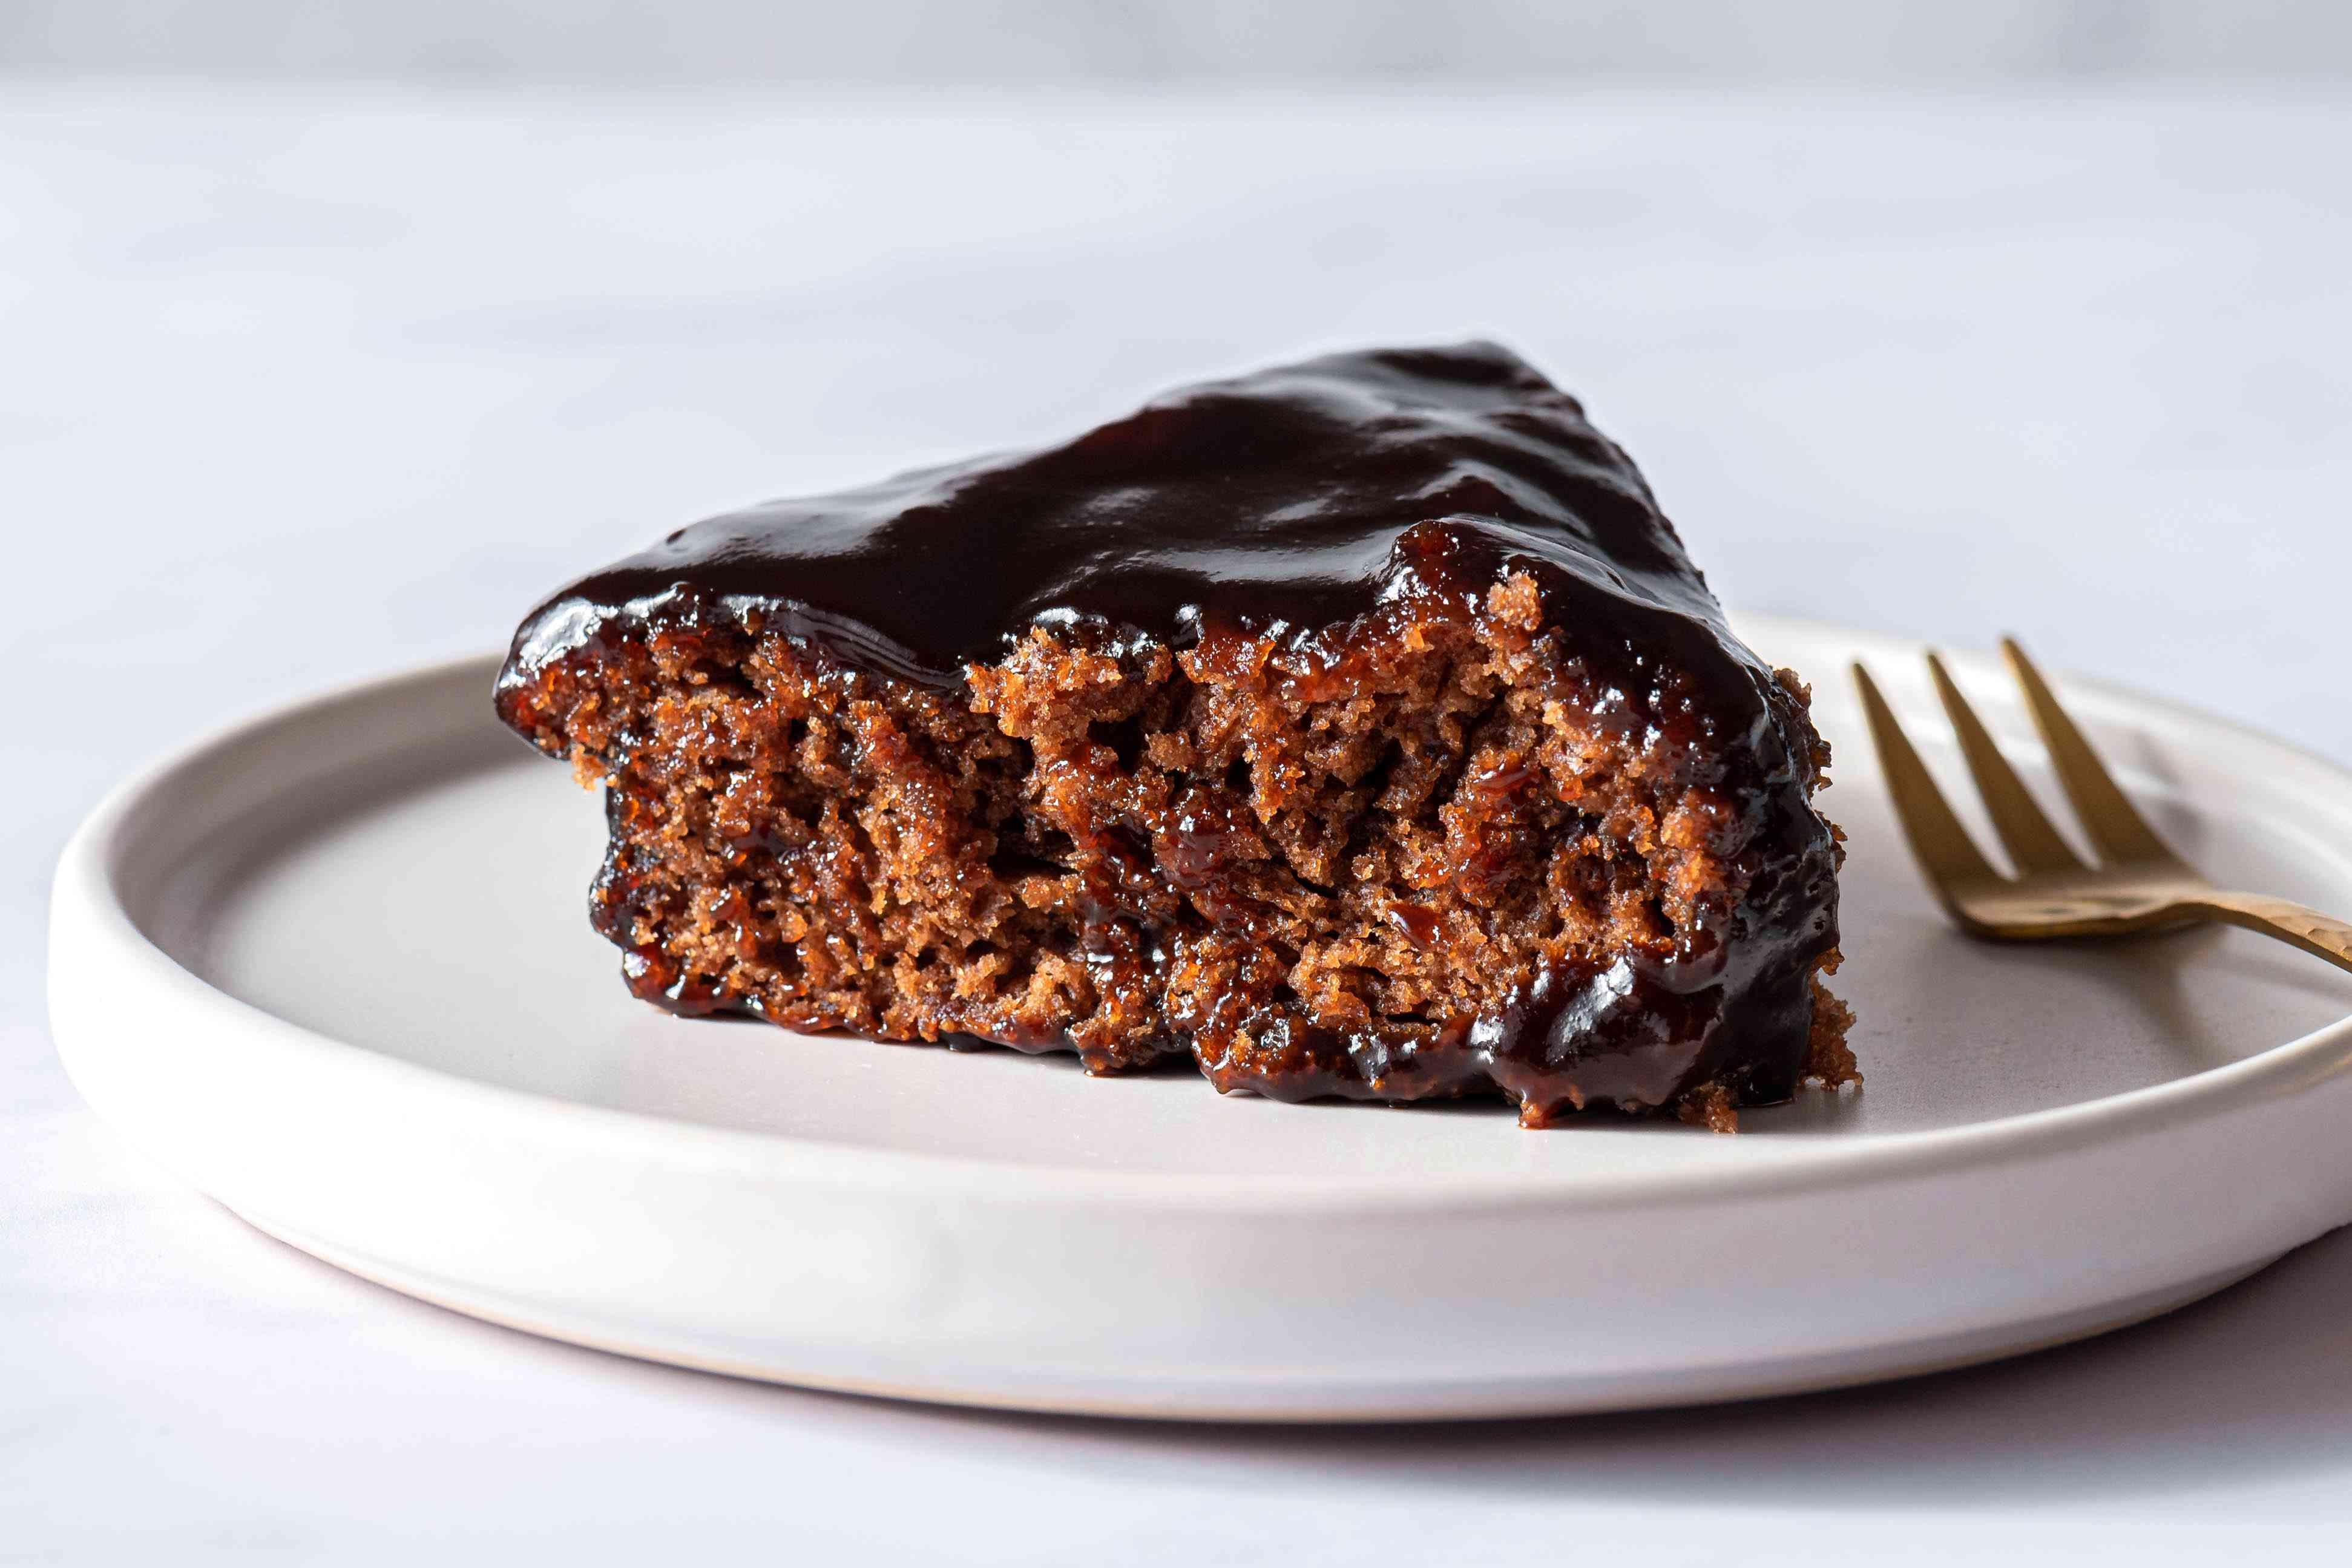 Chocolate Upside Down Cake slice